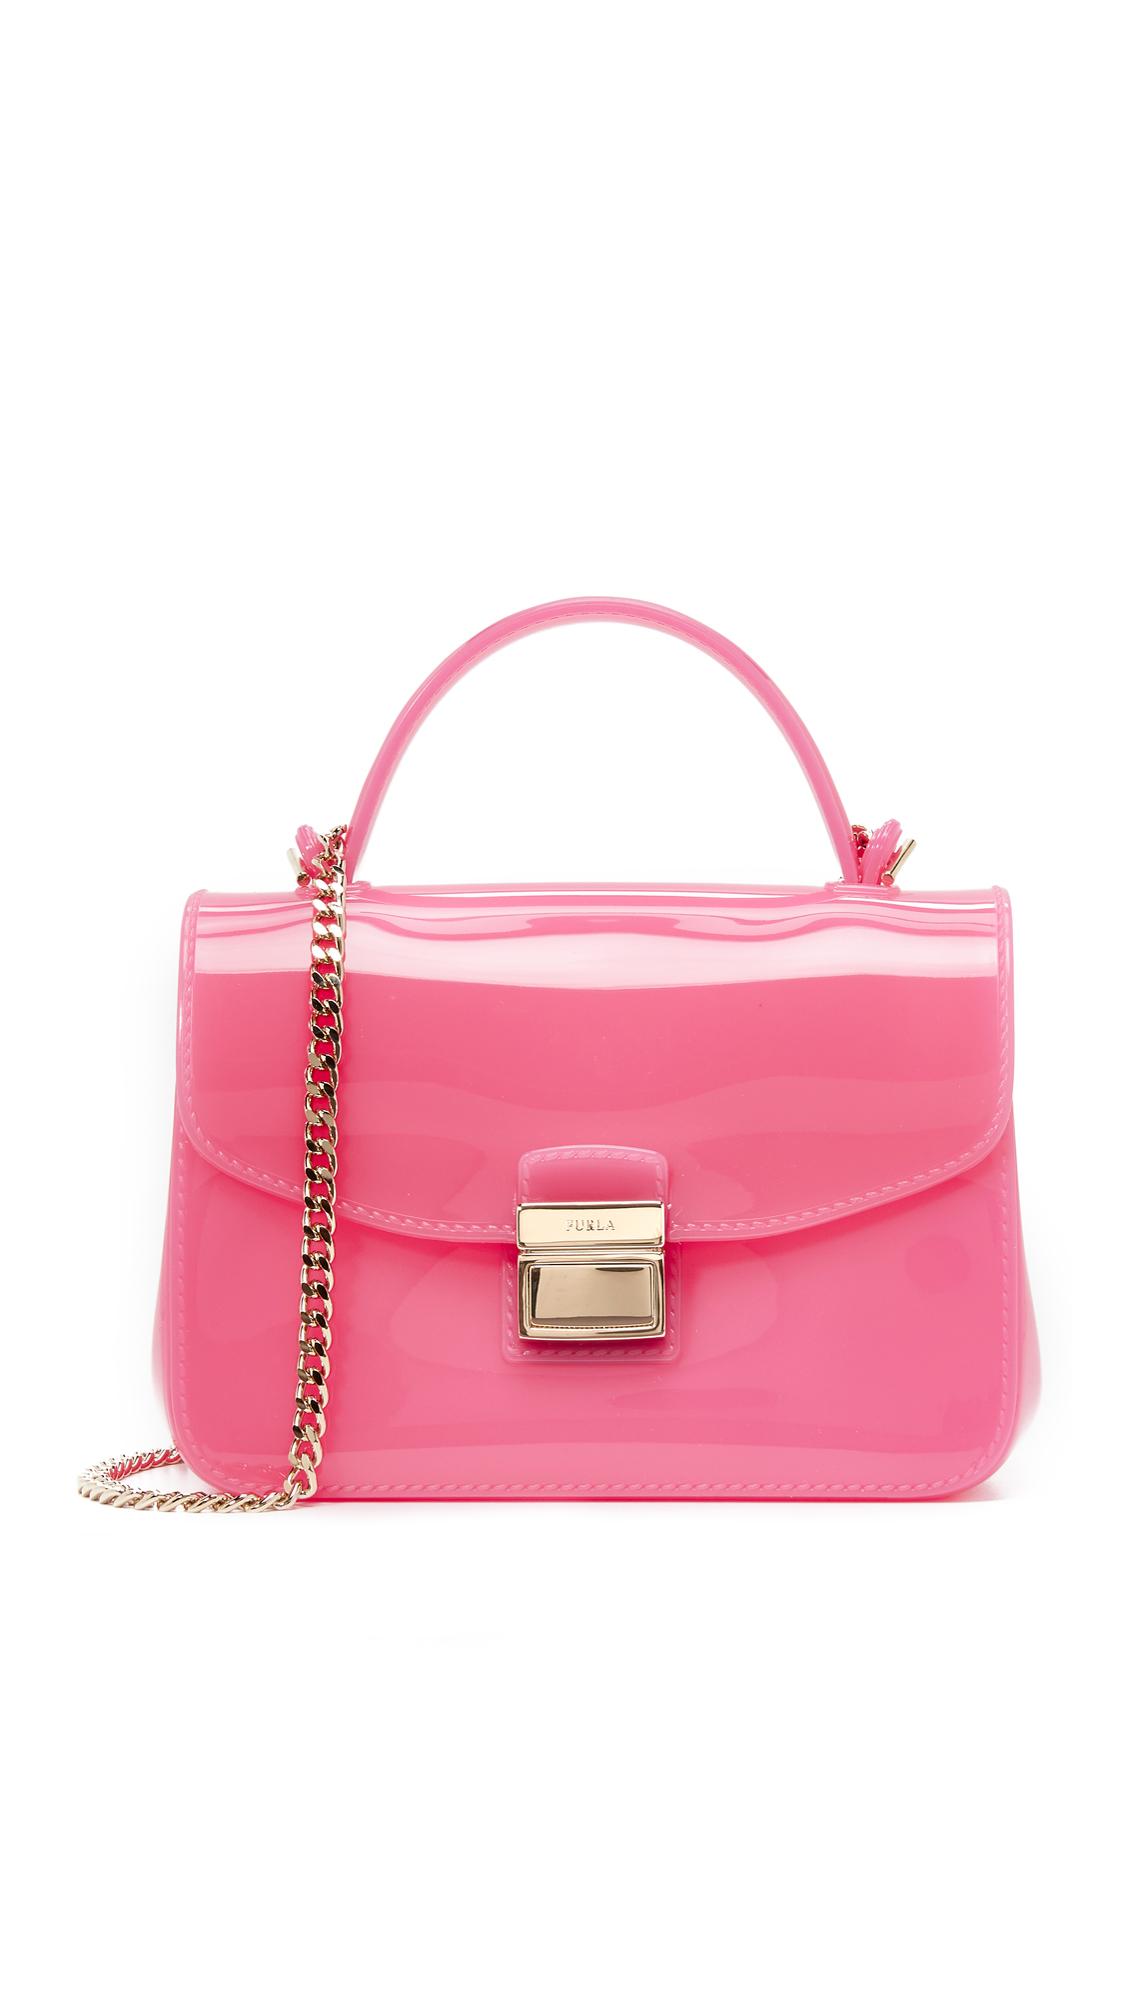 Furla Candy Metropolis Mini Cross Body Bag in Pink